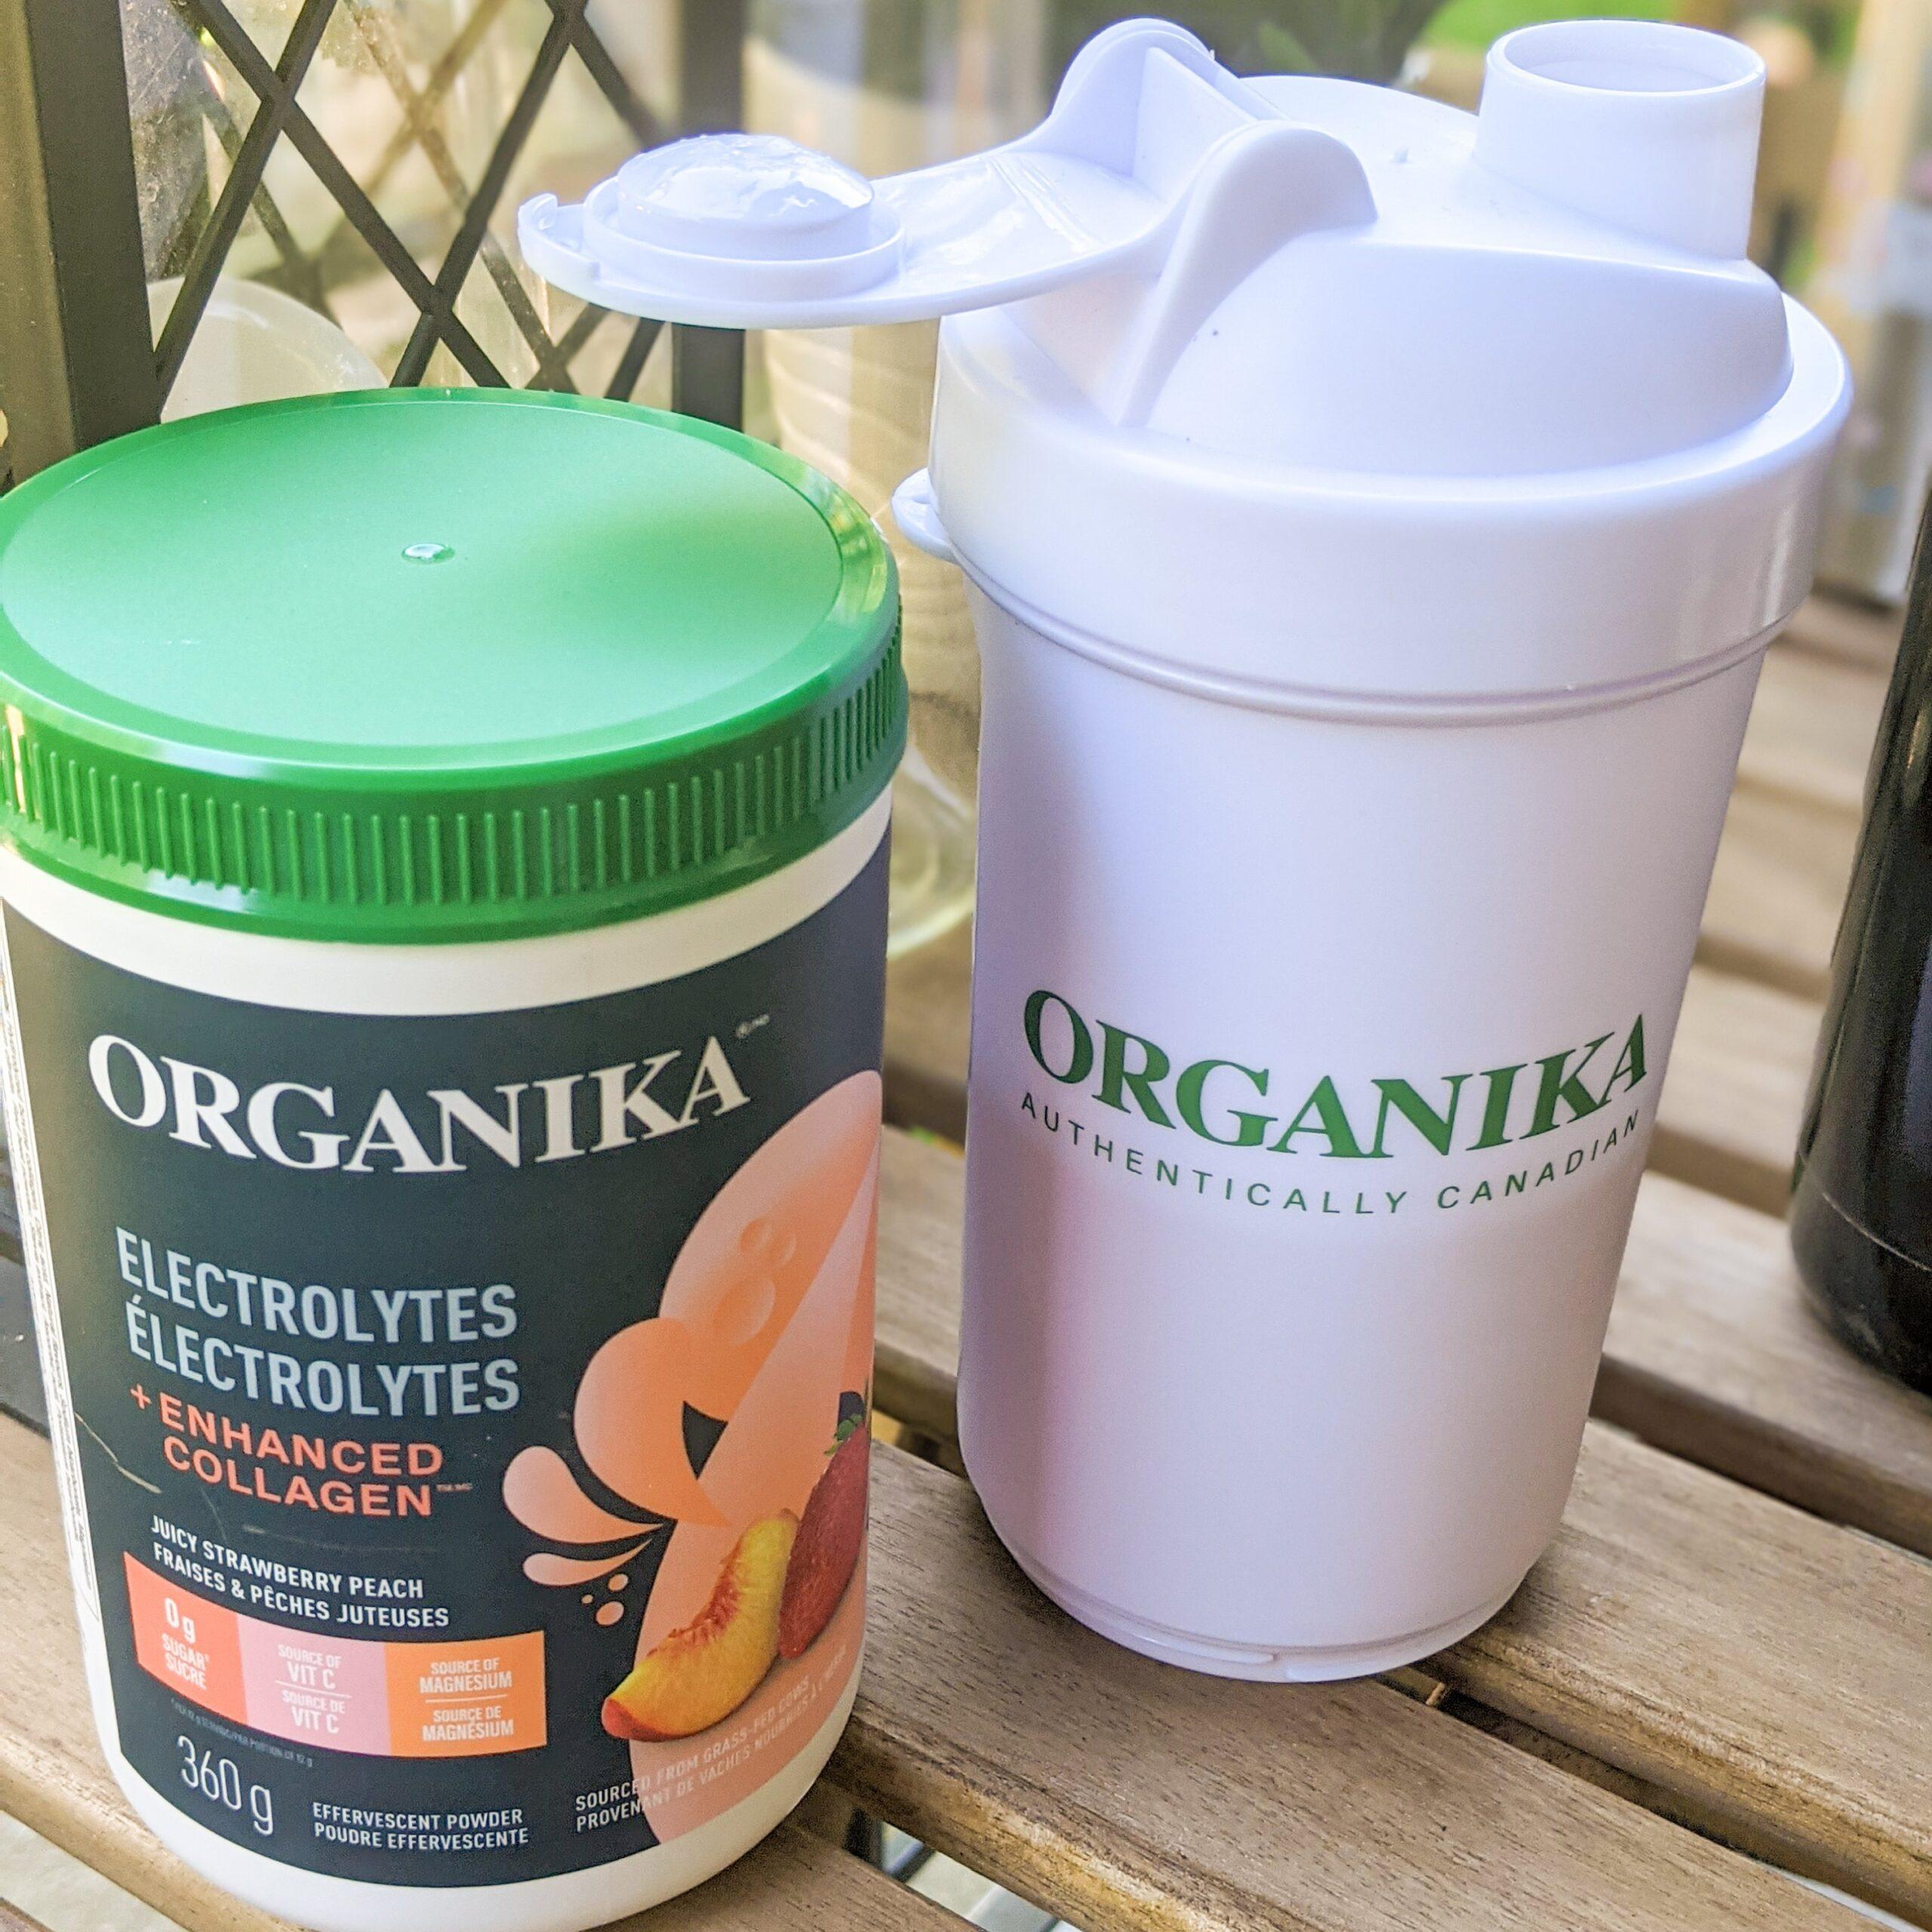 organika electrolytes and enhanced collagen